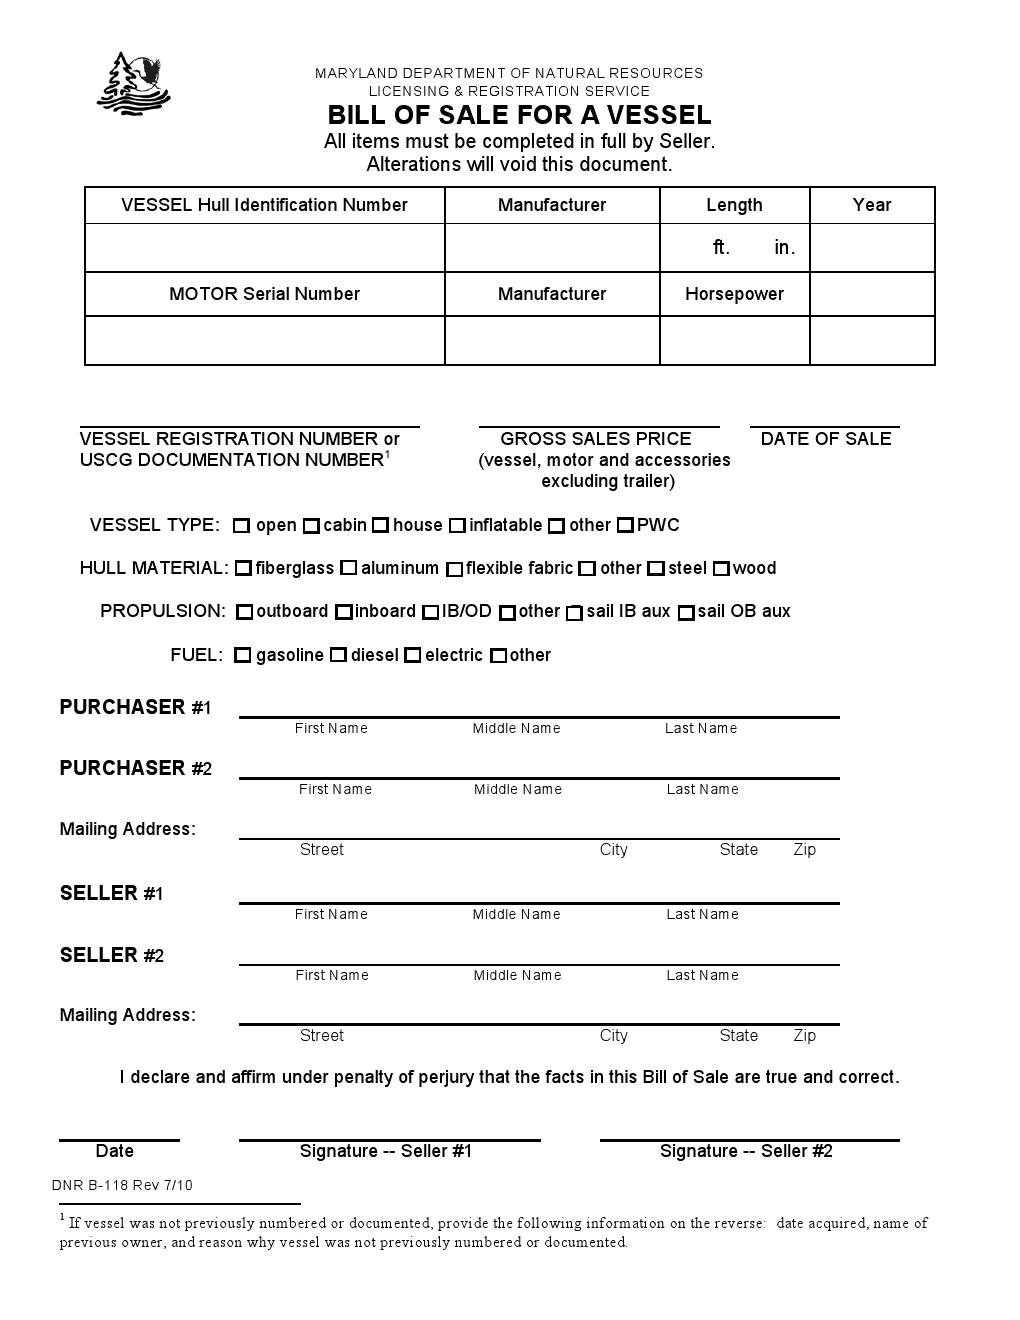 Maryland Vessel Bill of Sale